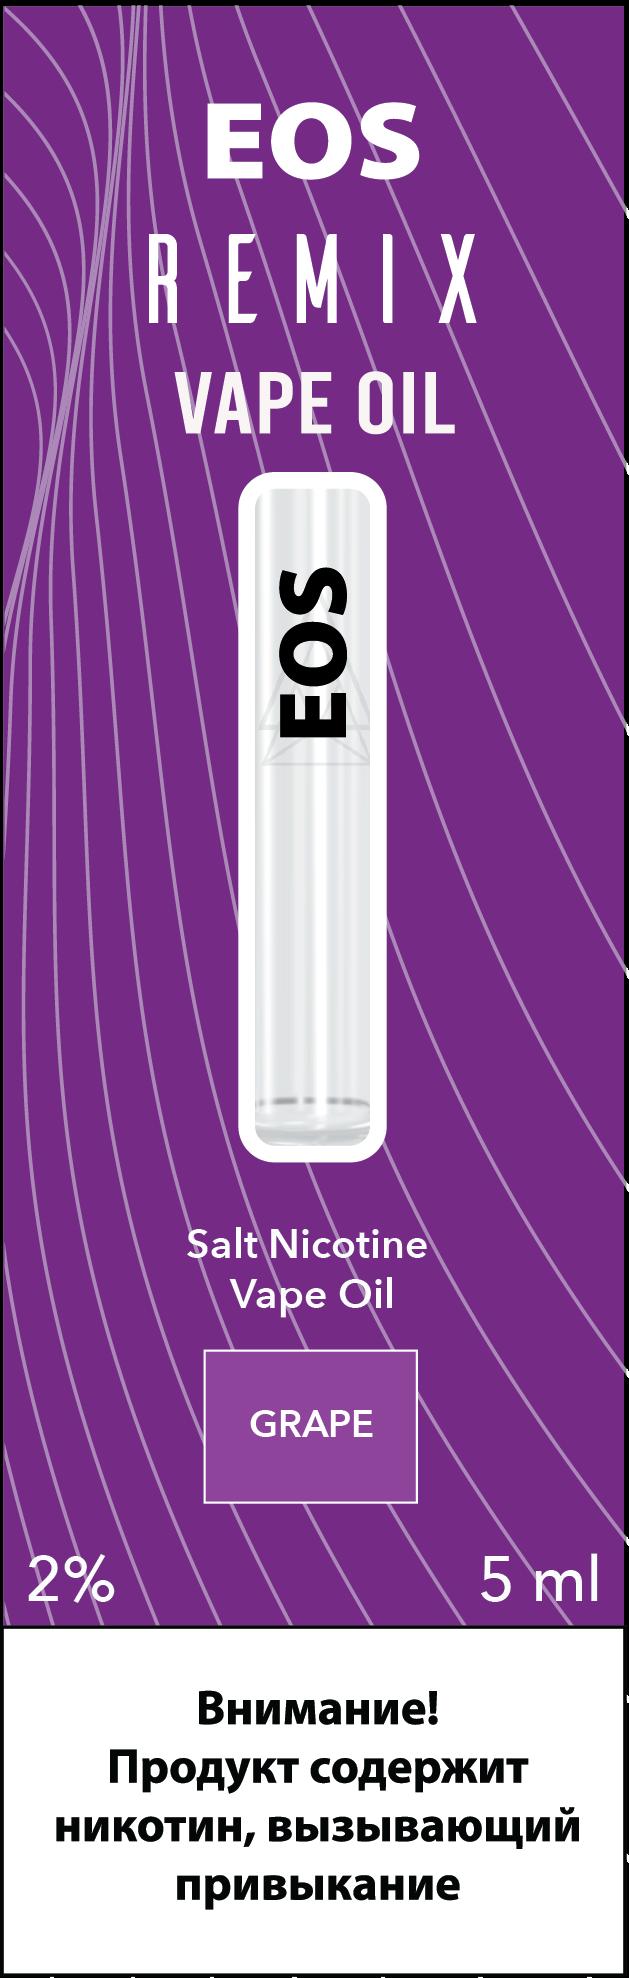 EOS REMIX SALT NIC GRAPE 2% 5ml